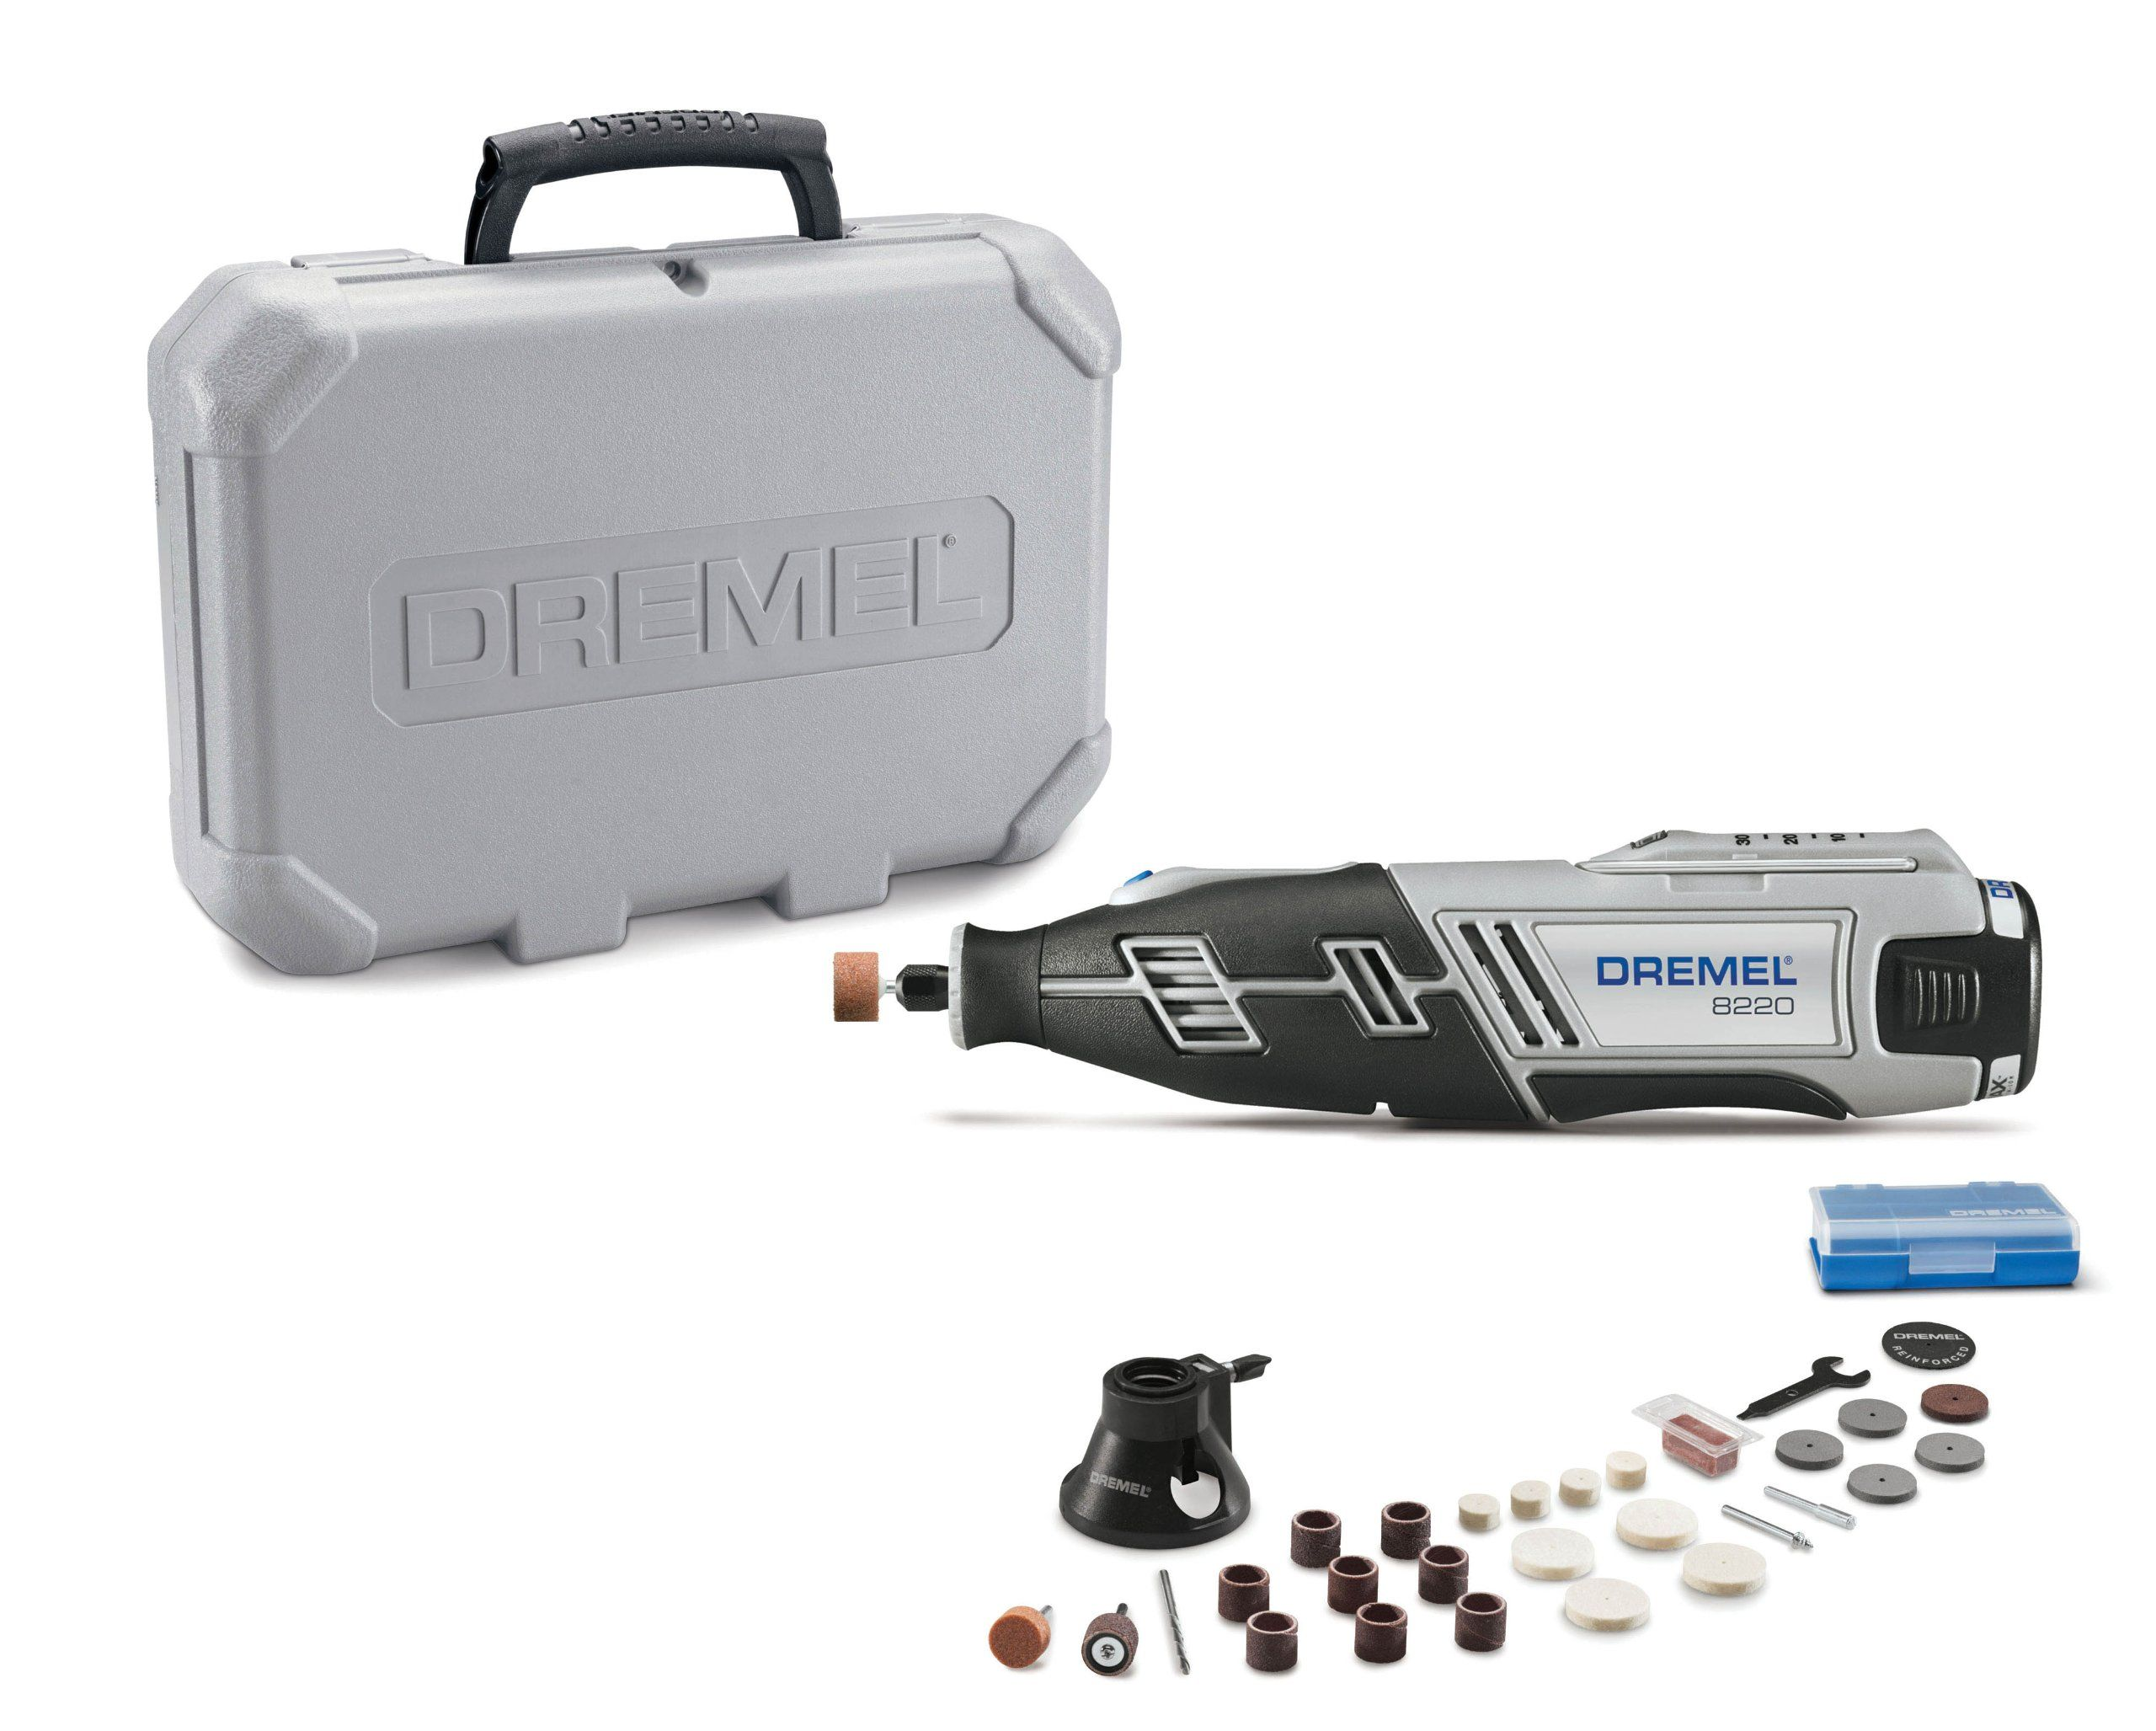 Dremel 8220128 12volt max cordless rotary tool power